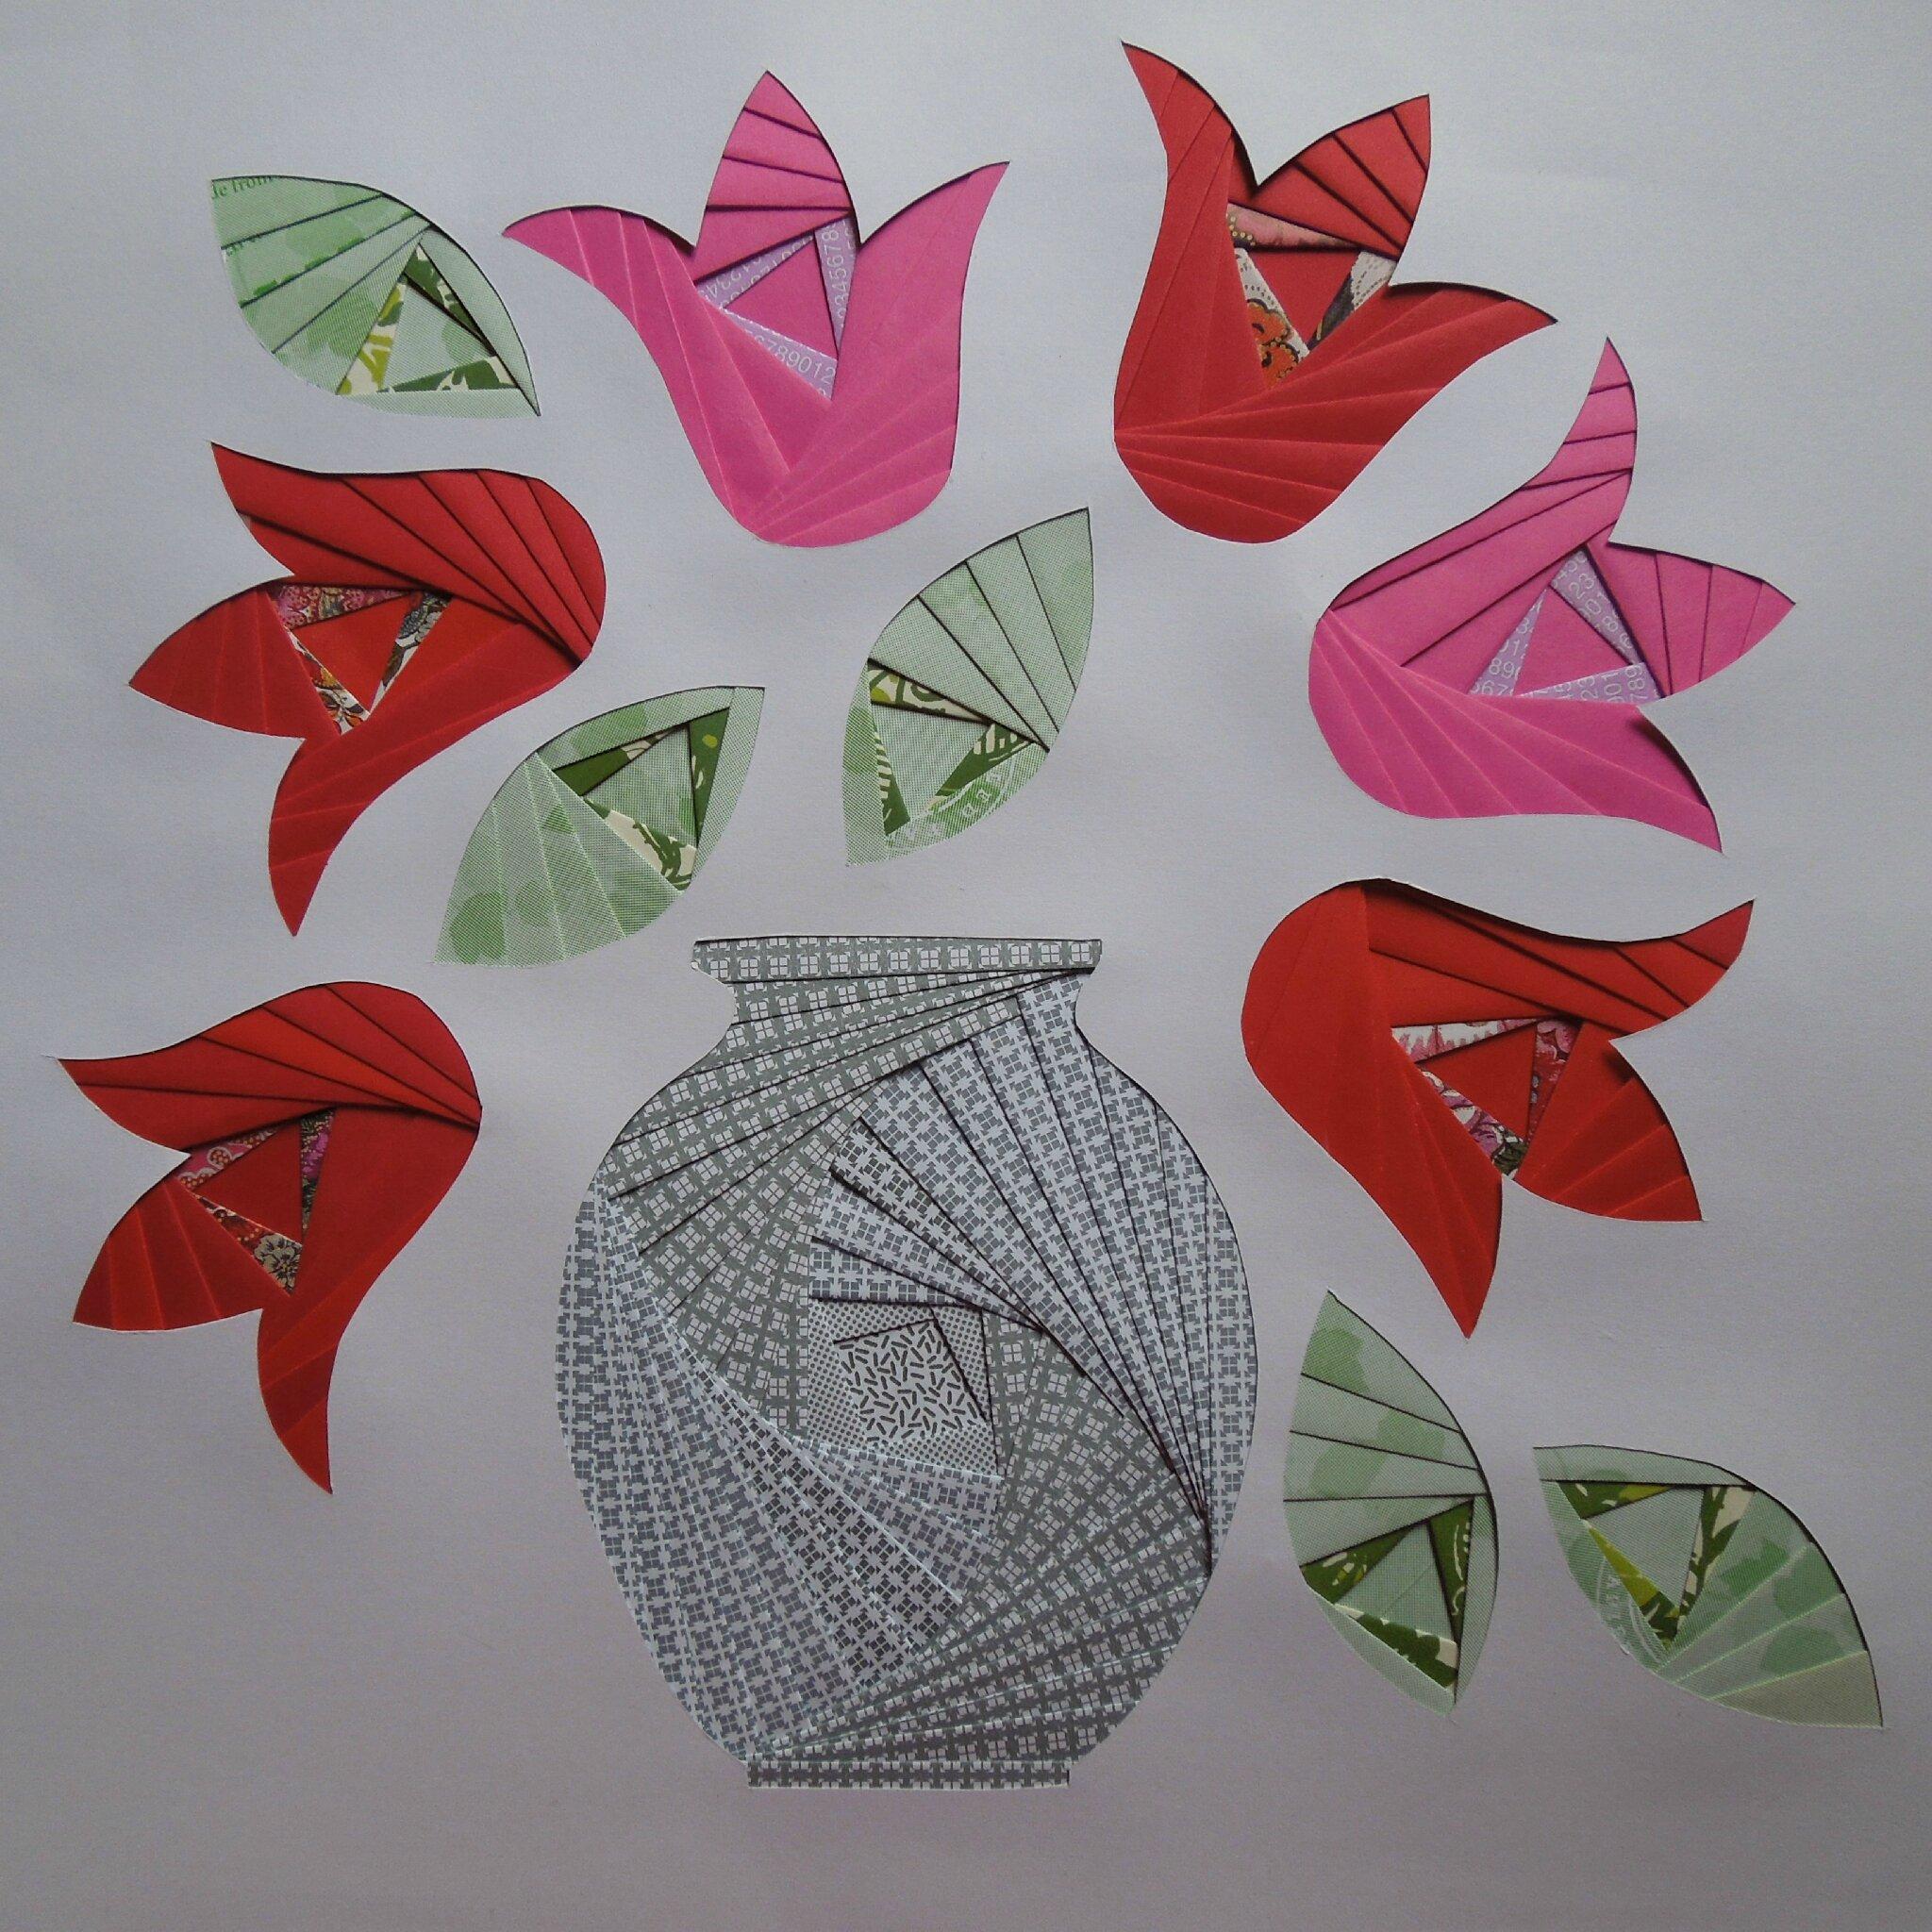 iris folding 0110